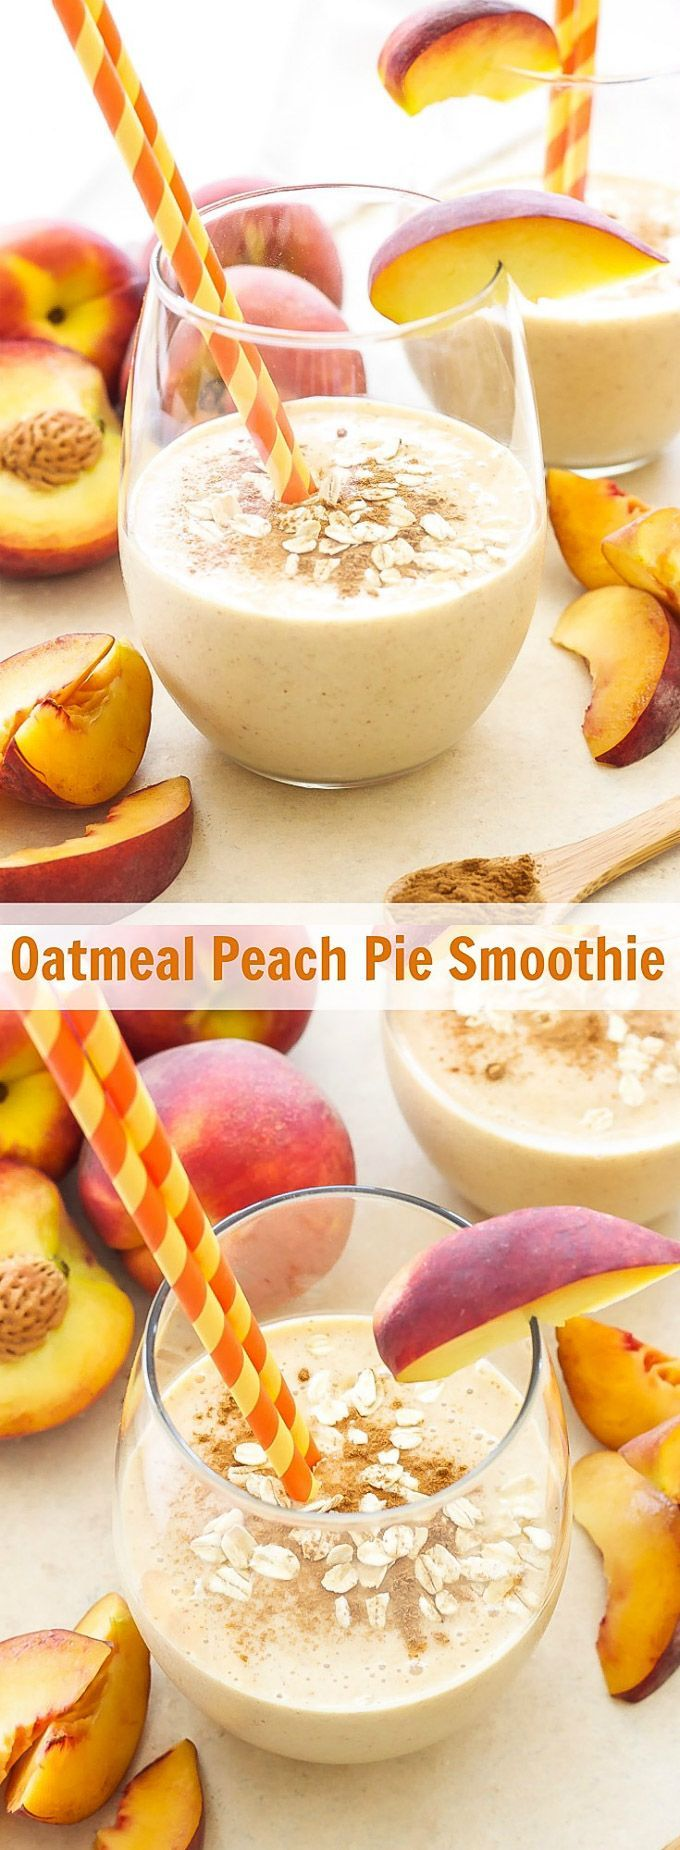 Oatmeal Peach Pie Smoothie